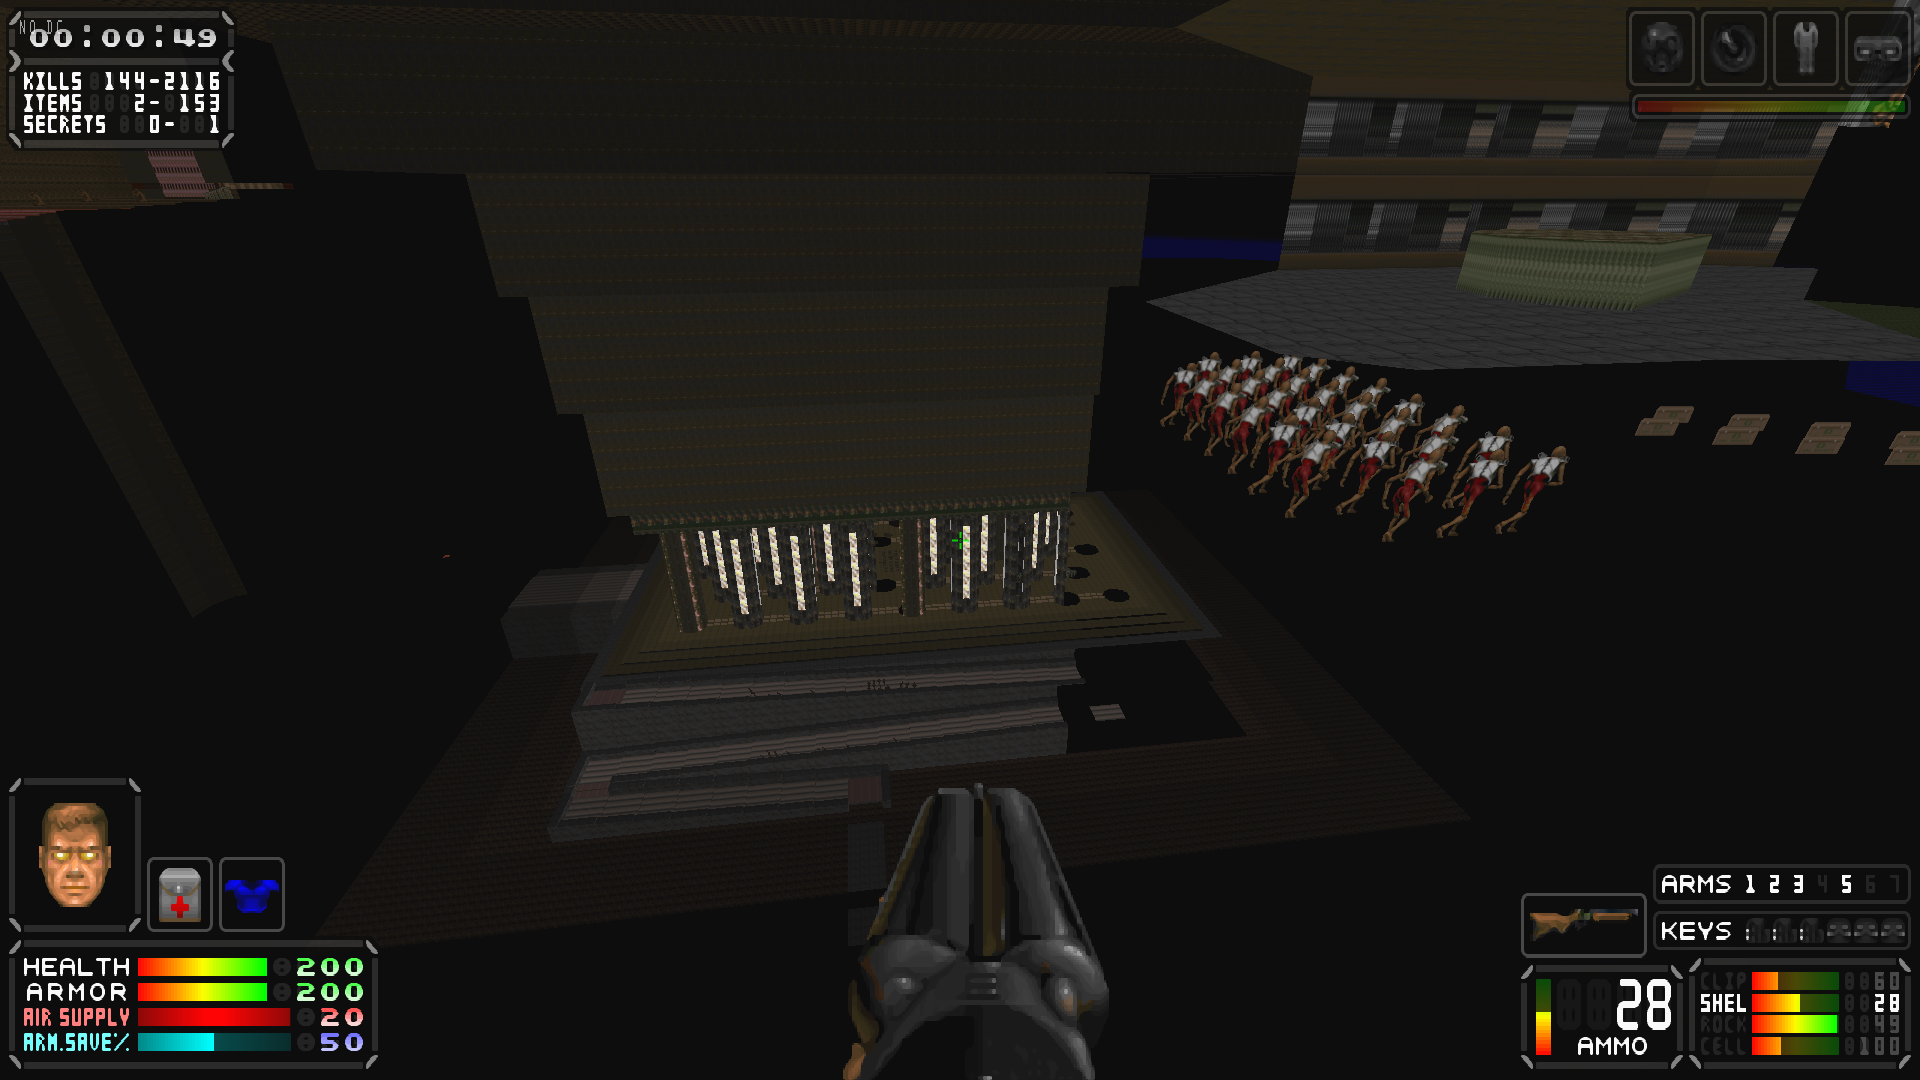 Screenshot_Doom_20210821_154247.png.19ad8196e5817d167865135acd1080dd.png